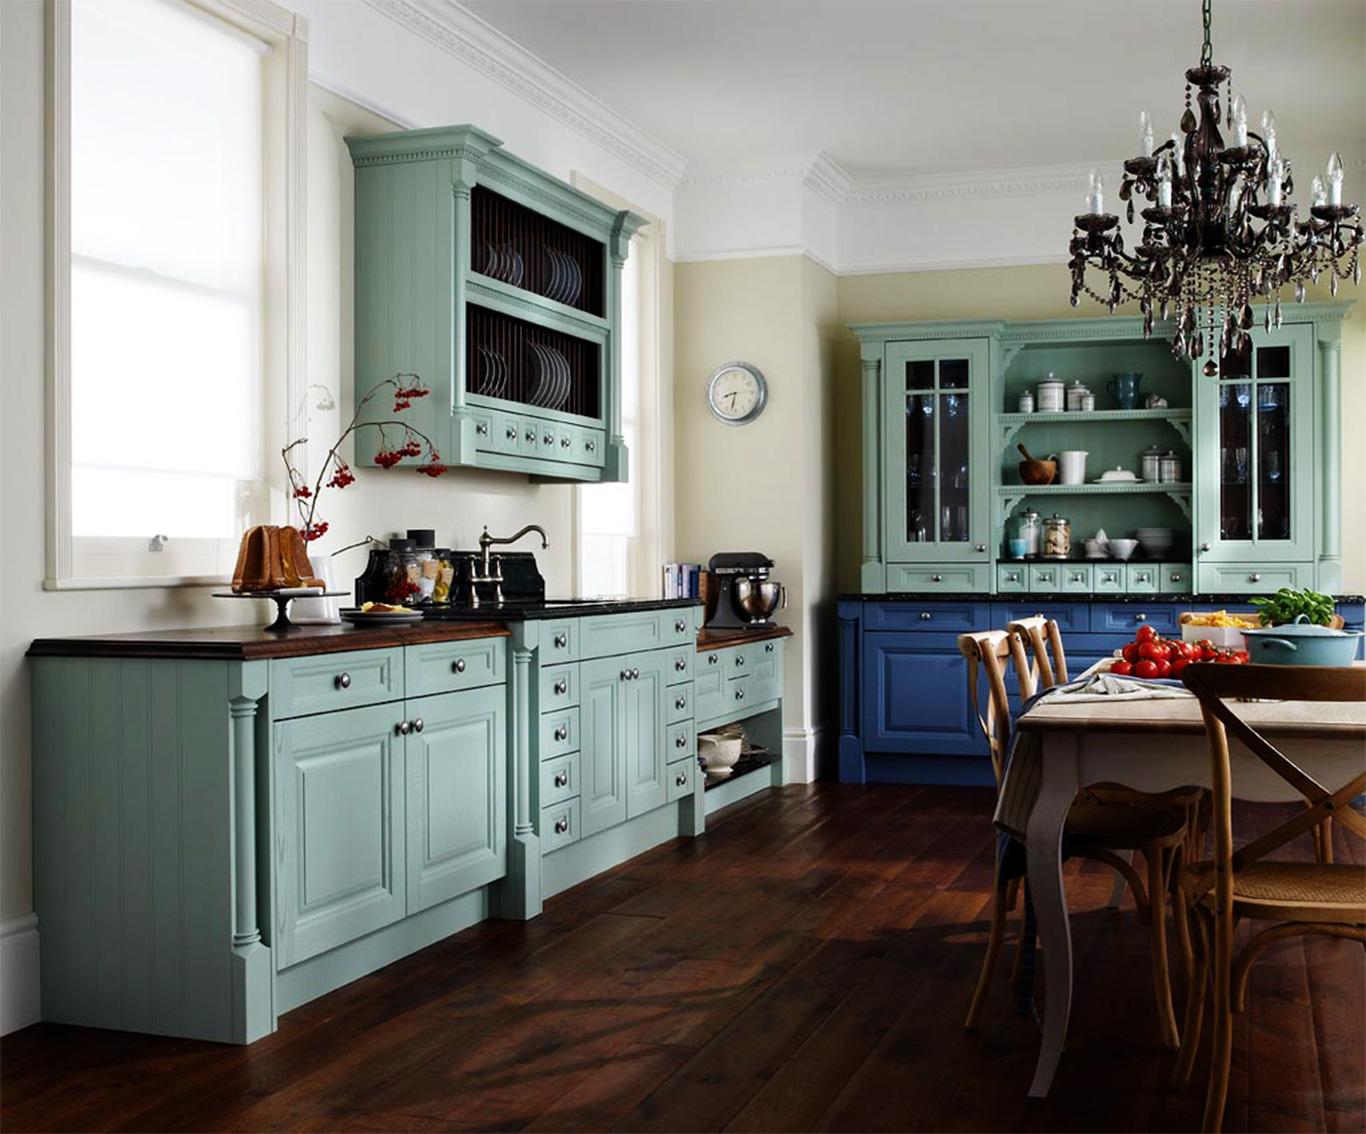 kitchen cabinets ideas colors photo - 2